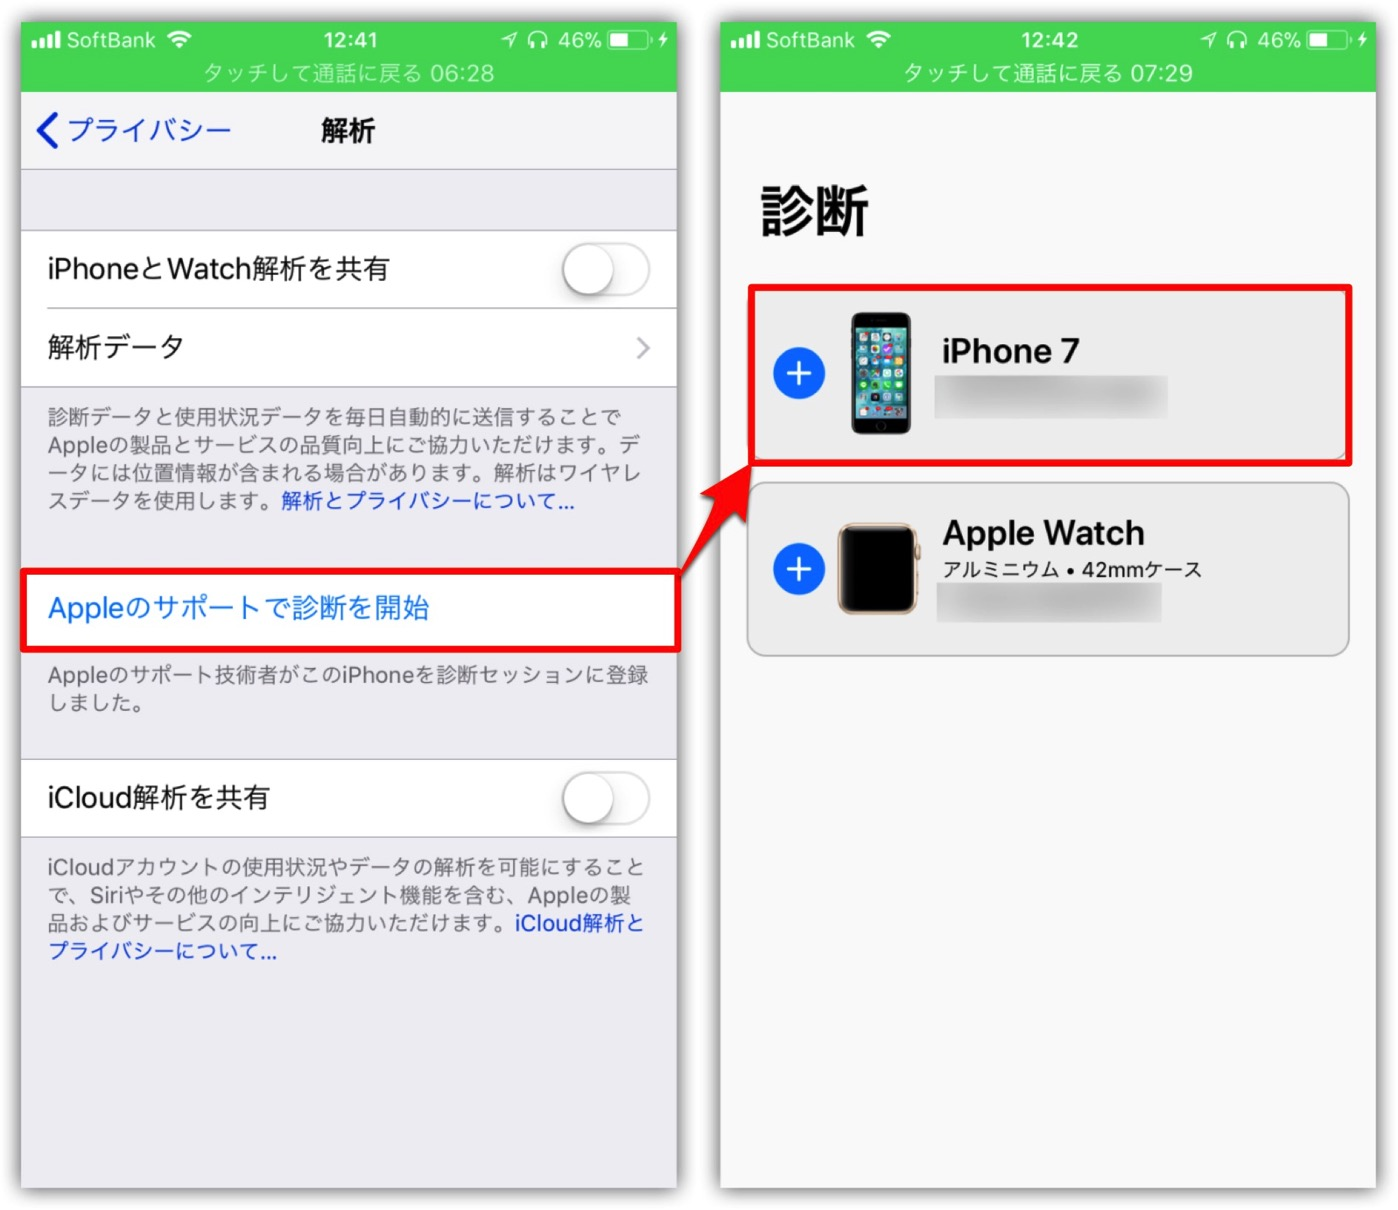 AppleCare-7